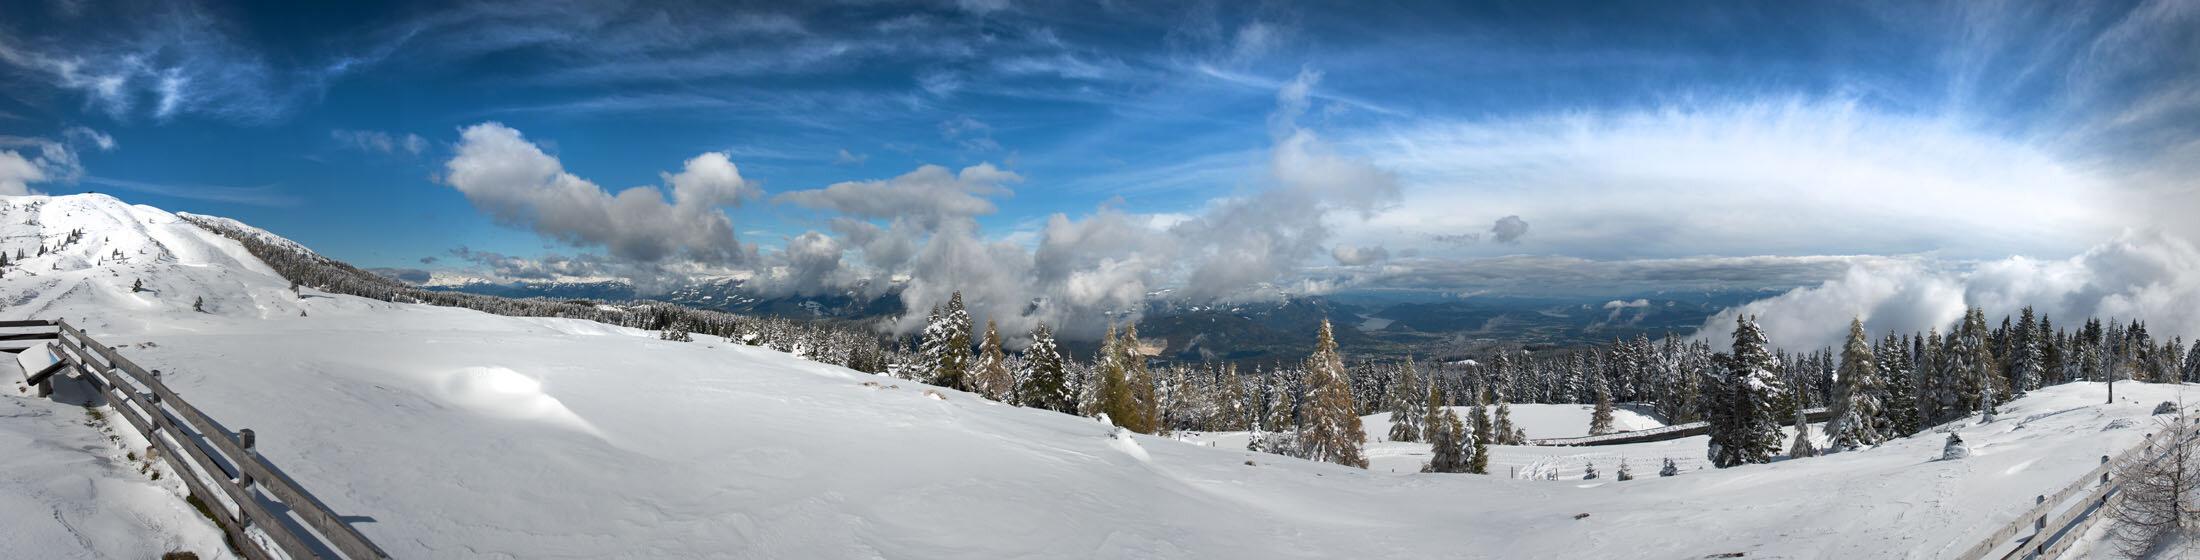 Villacher Alps